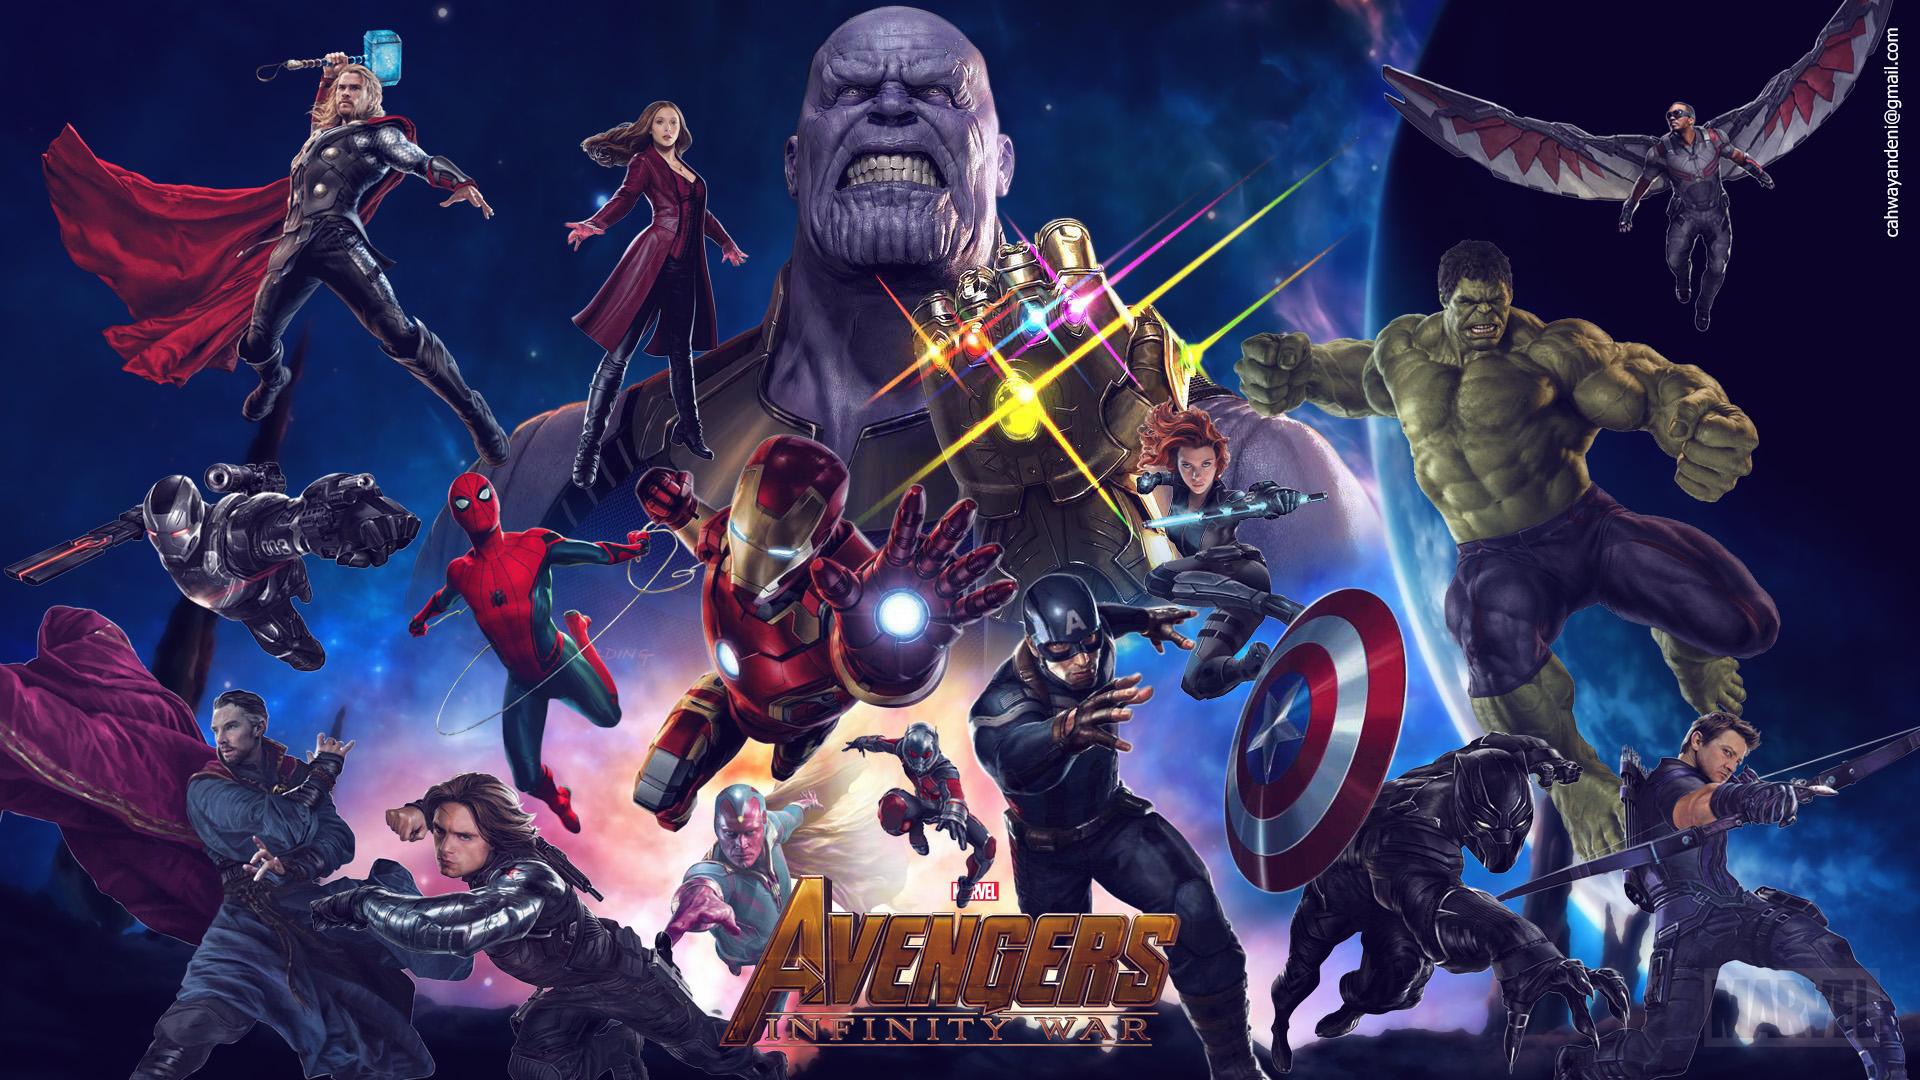 avengers infinity war 2018 movie hd movies 4k wallpapers